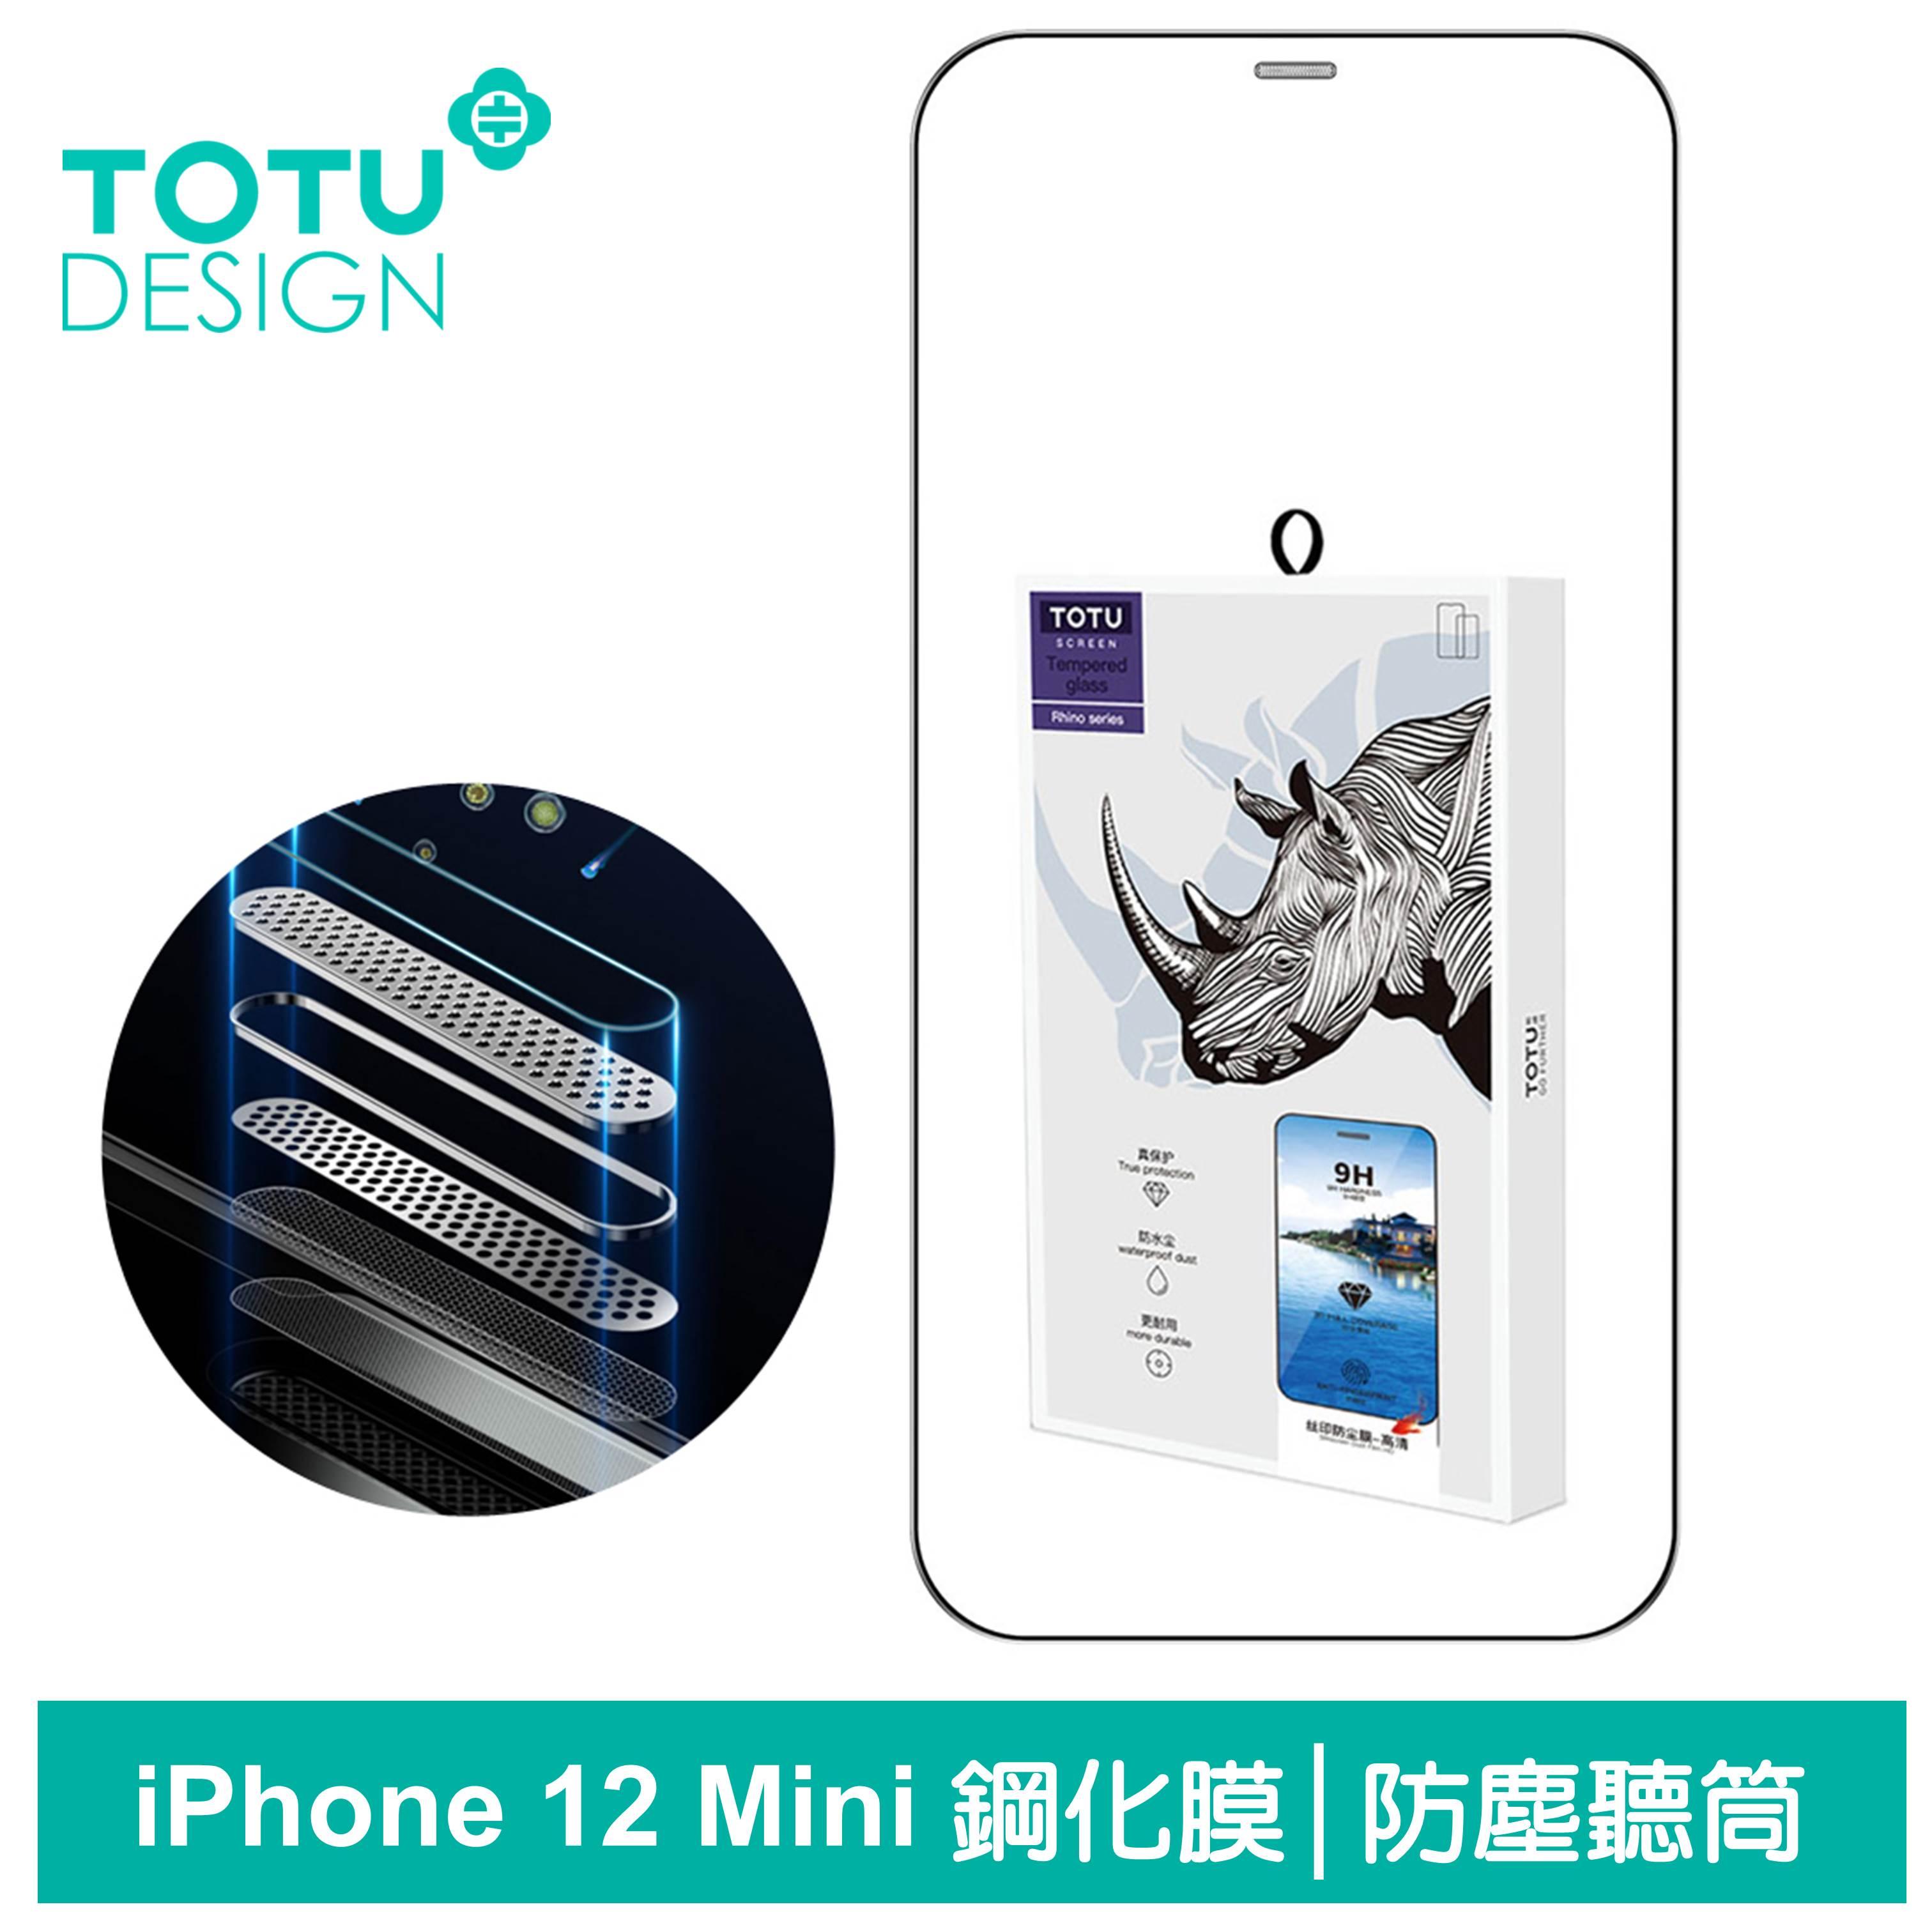 TOTU台灣官方 iPhone 12 Mini 鋼化膜 i12 Mini 保護貼 5.4吋 保護膜 絲印防塵聽筒 犀牛家族